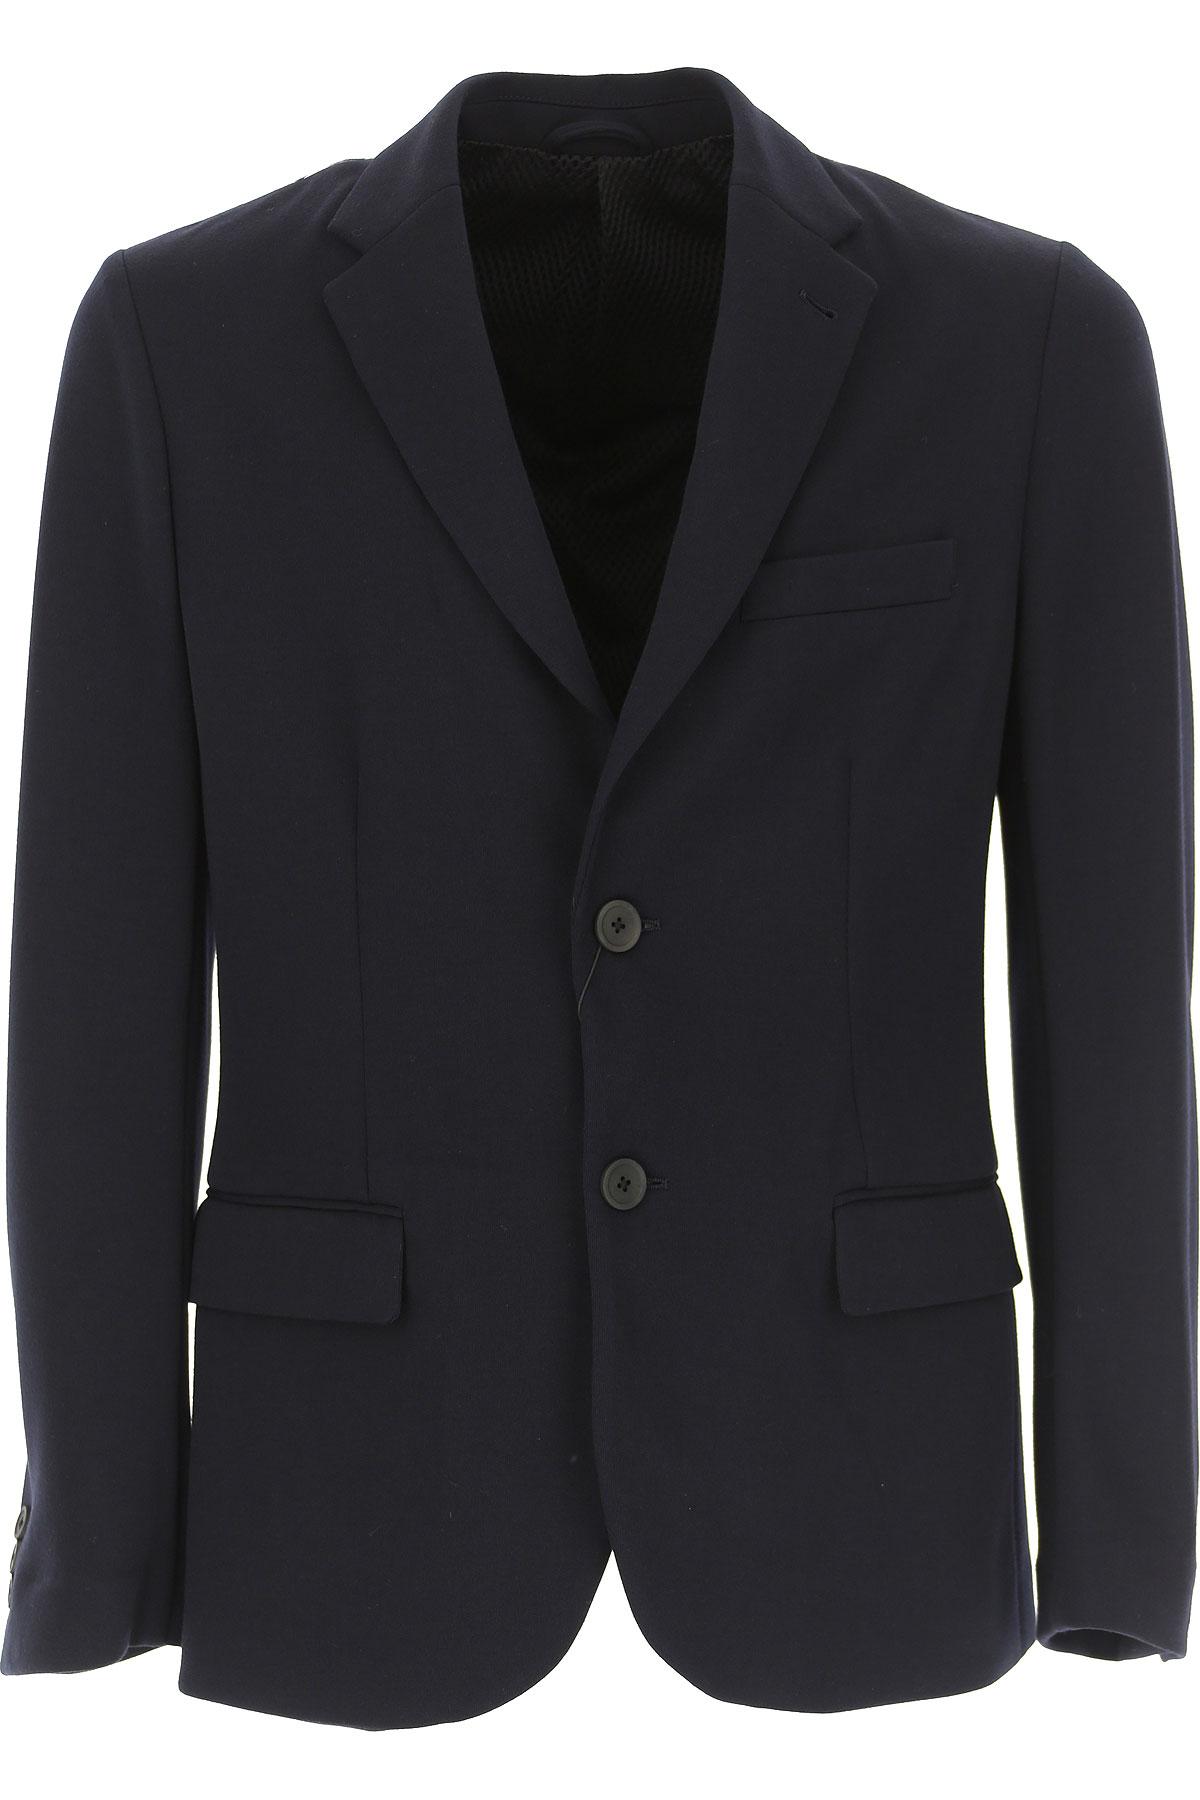 Emporio Armani Blazer for Men, Sport Coat On Sale, Navy Blue, polyester, 2019, L M